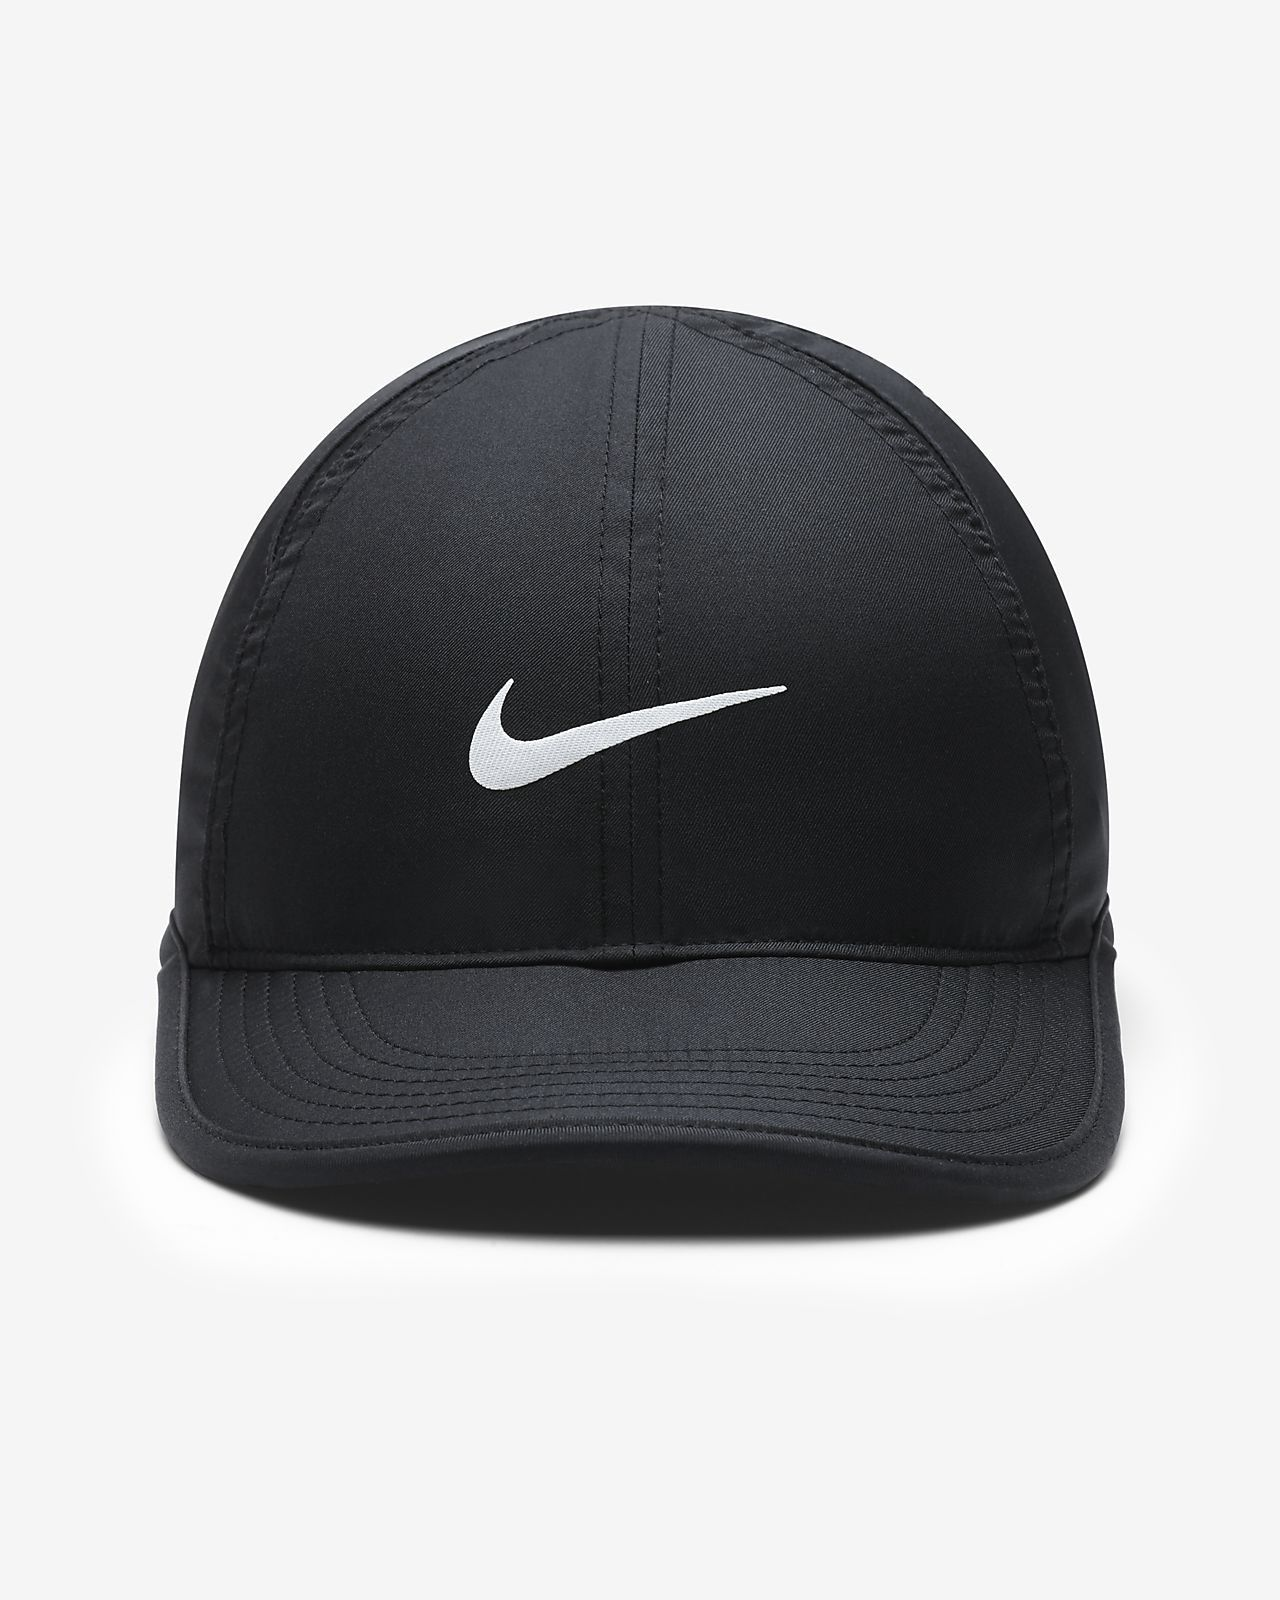 5780f8275c1 Nike Featherlight Big Kids  Adjustable Hat - Black Black White Os